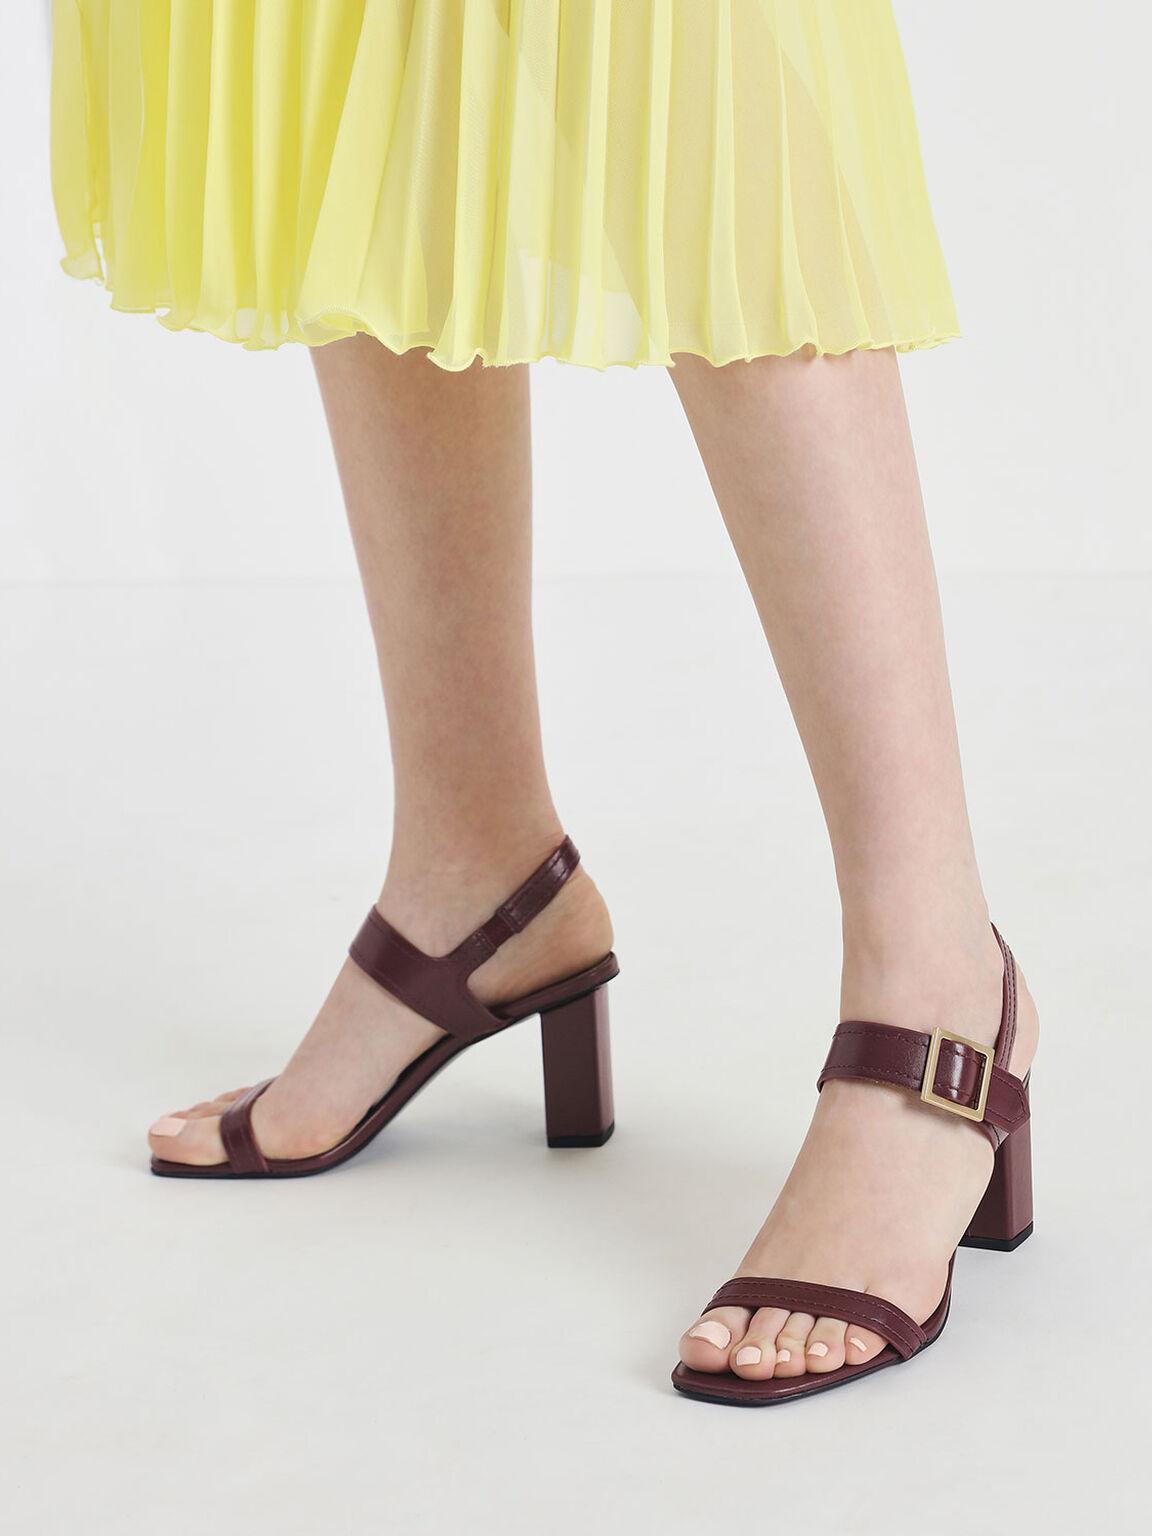 Buckle Detail Block Heel Sandals, Burgundy, hi-res